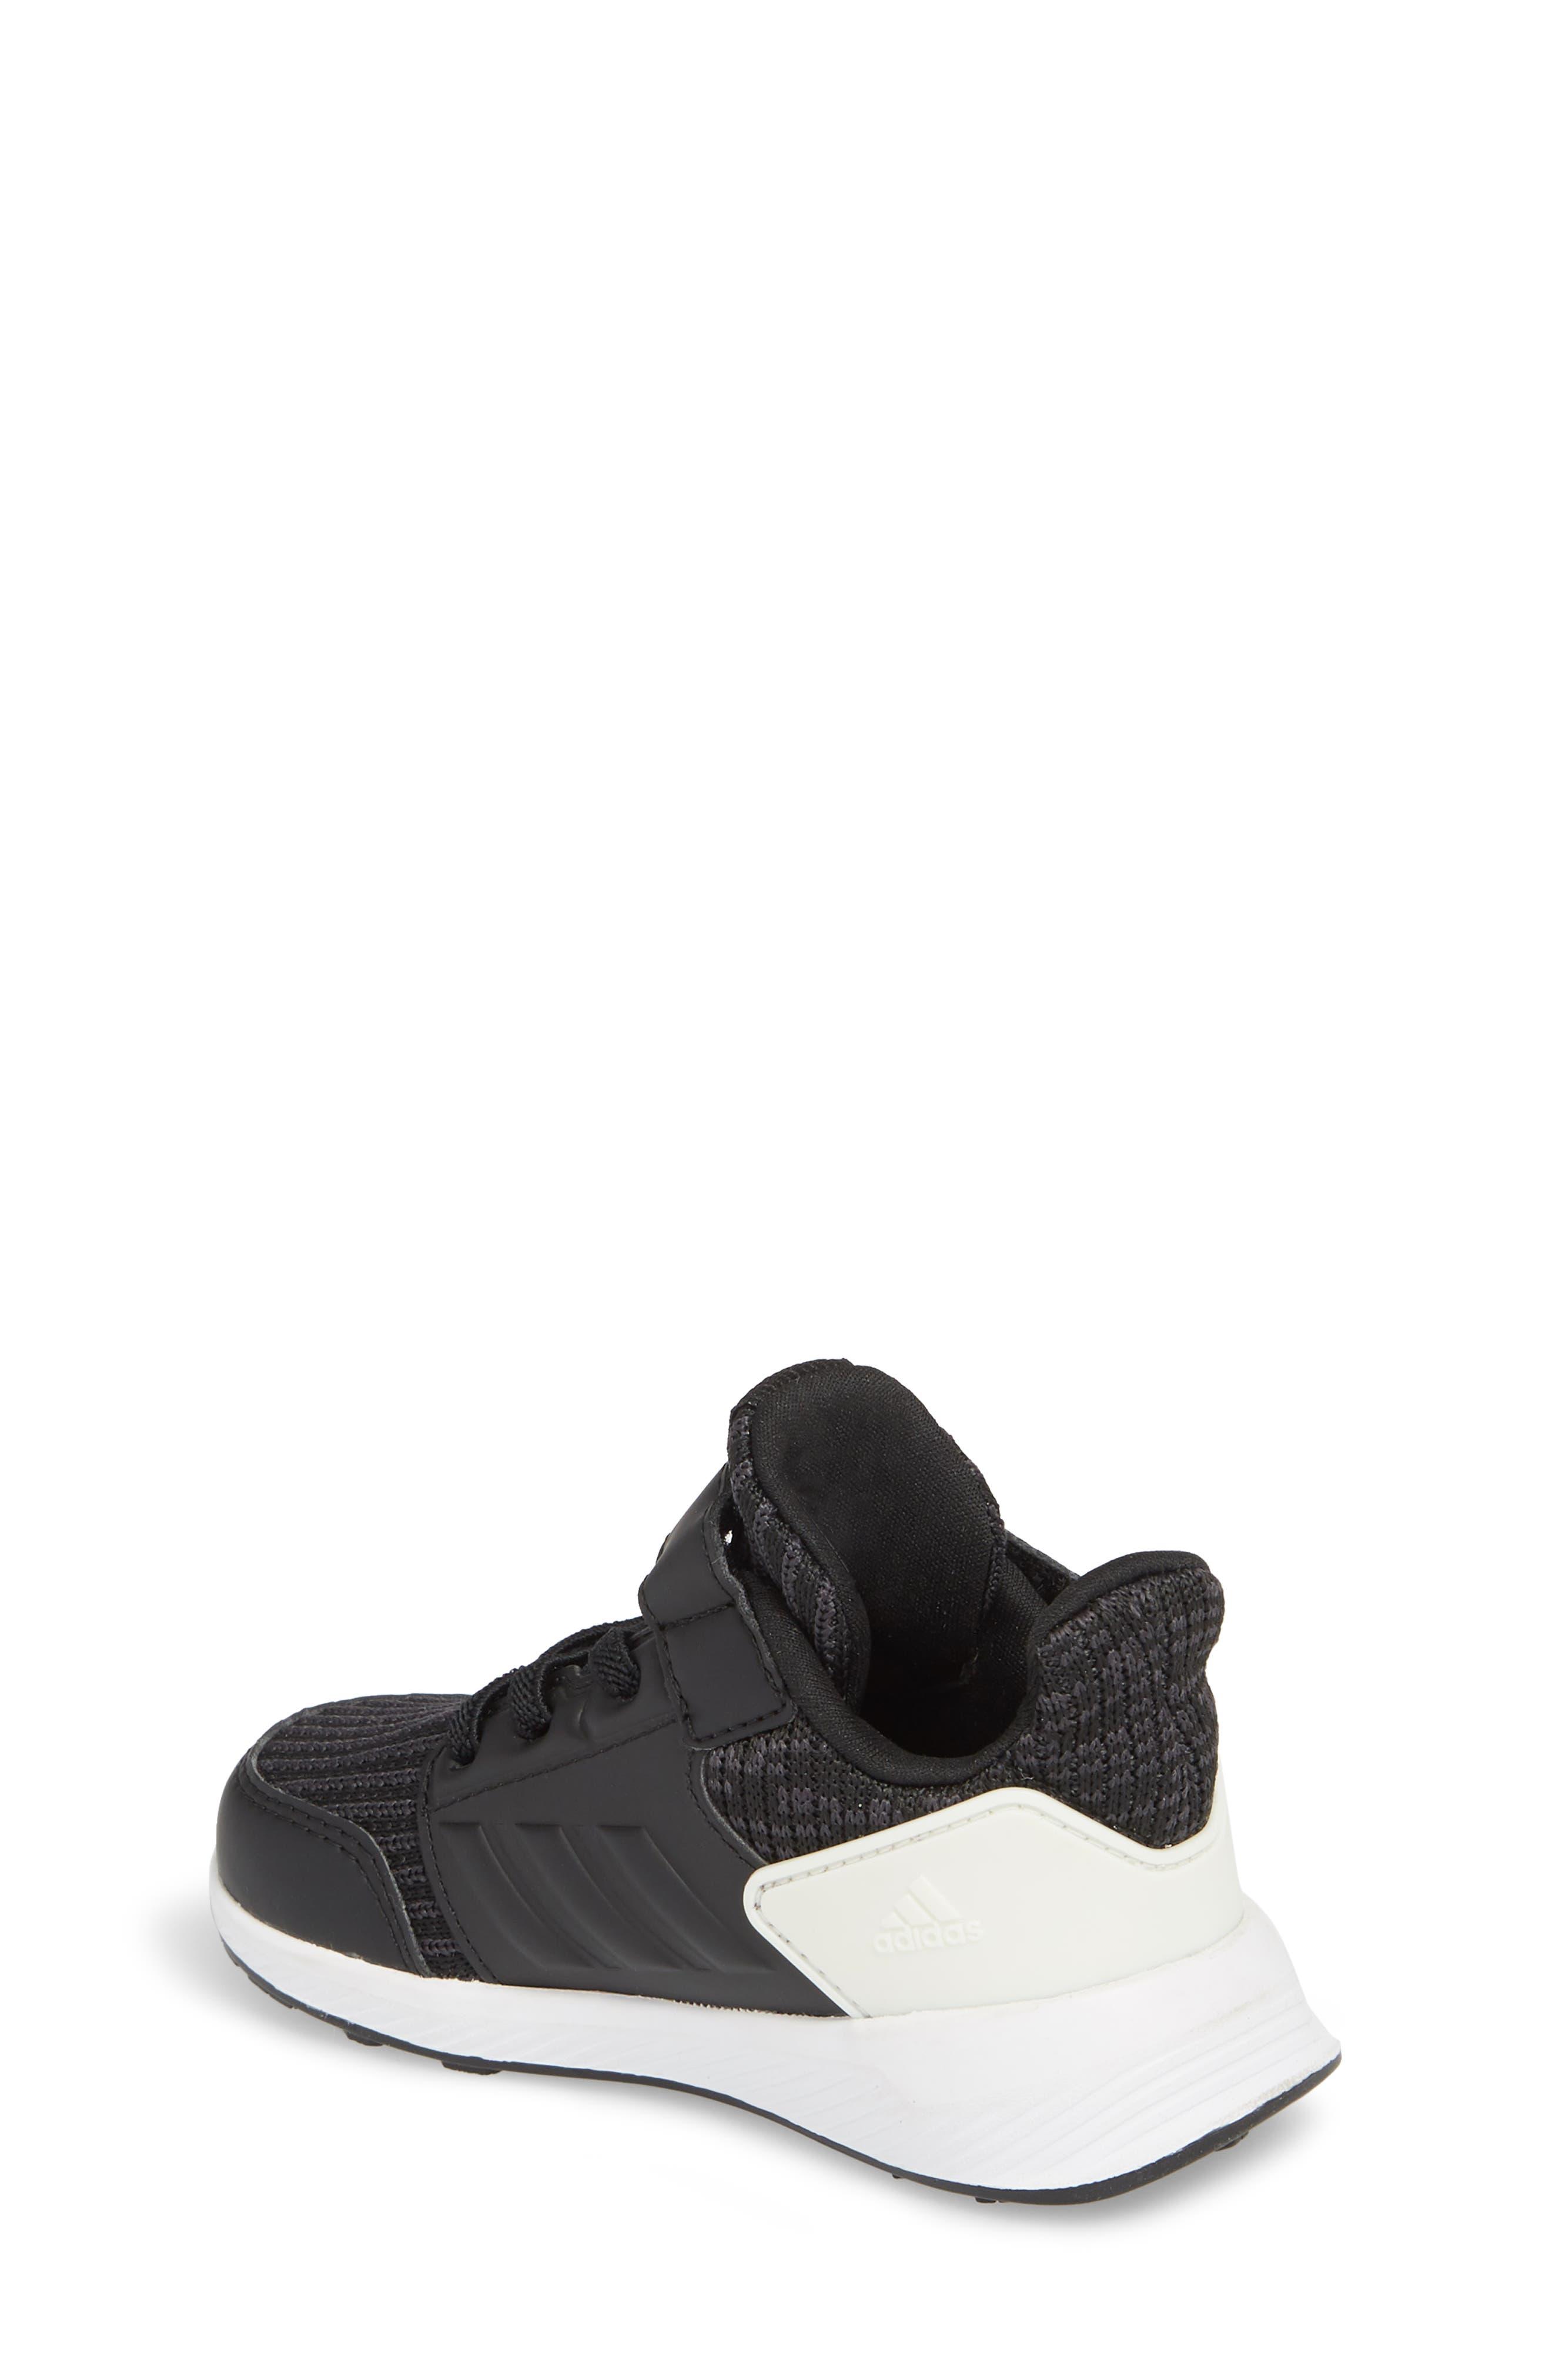 RapidaRun Knit Sneaker,                             Alternate thumbnail 2, color,                             BLACK/ WHITE